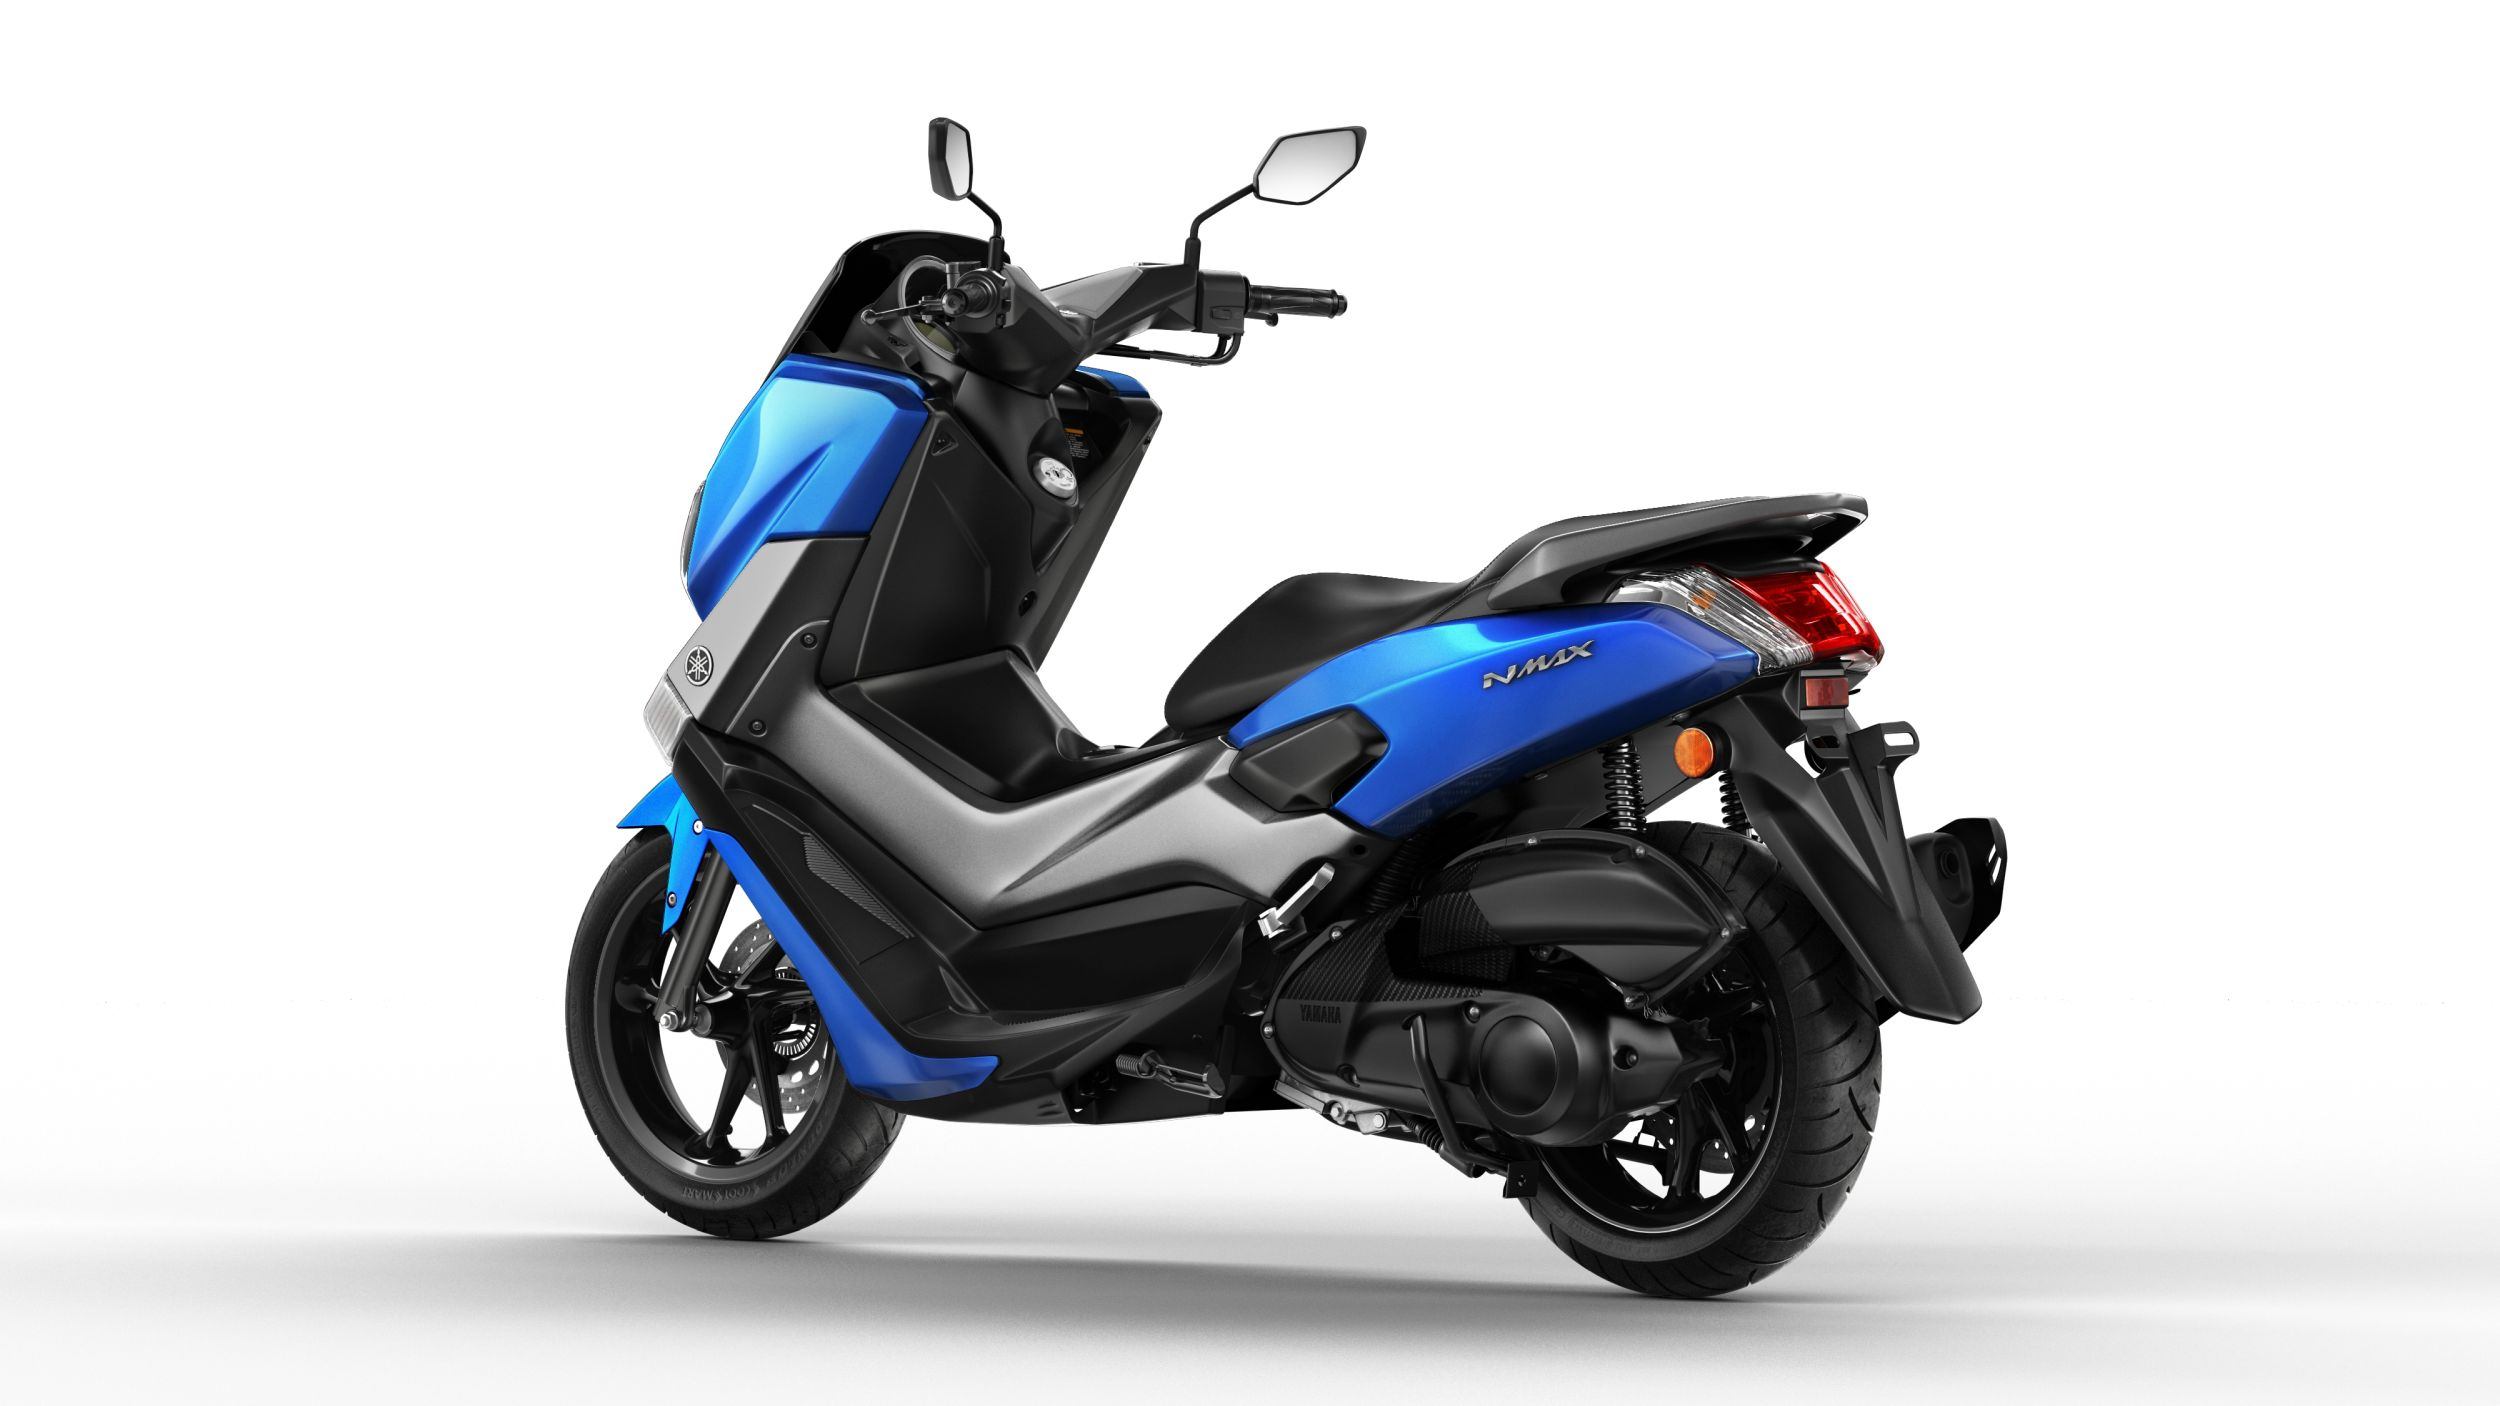 Motorrad Occasion Yamaha NMAX 125 kaufen